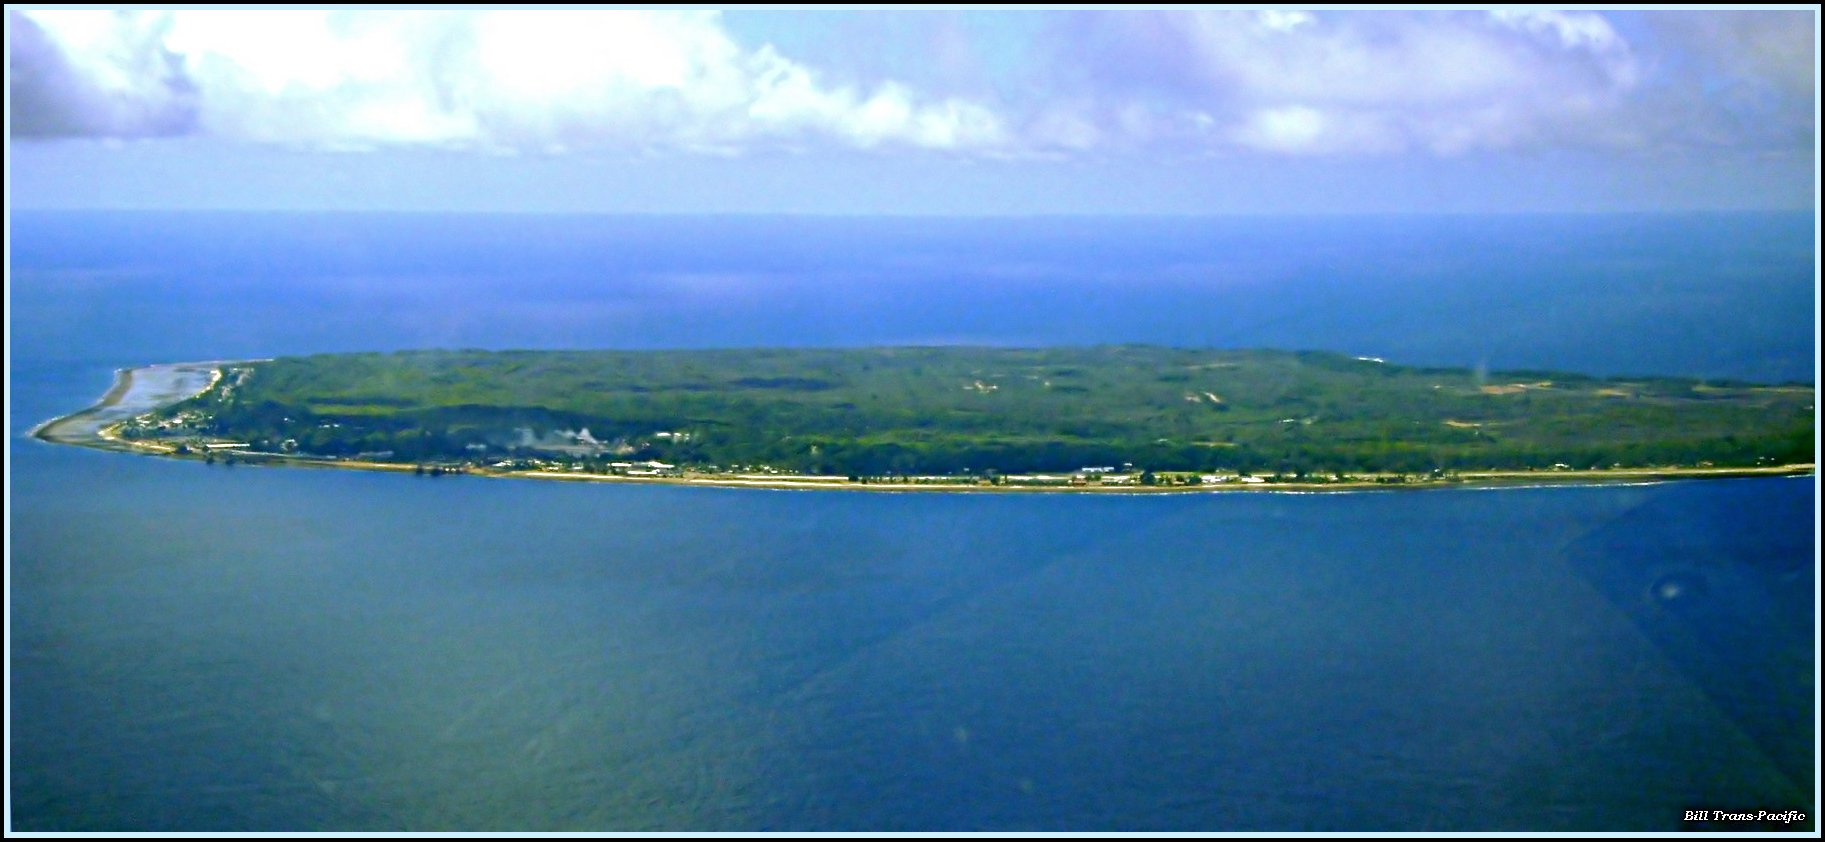 The Island Republic of Nauru